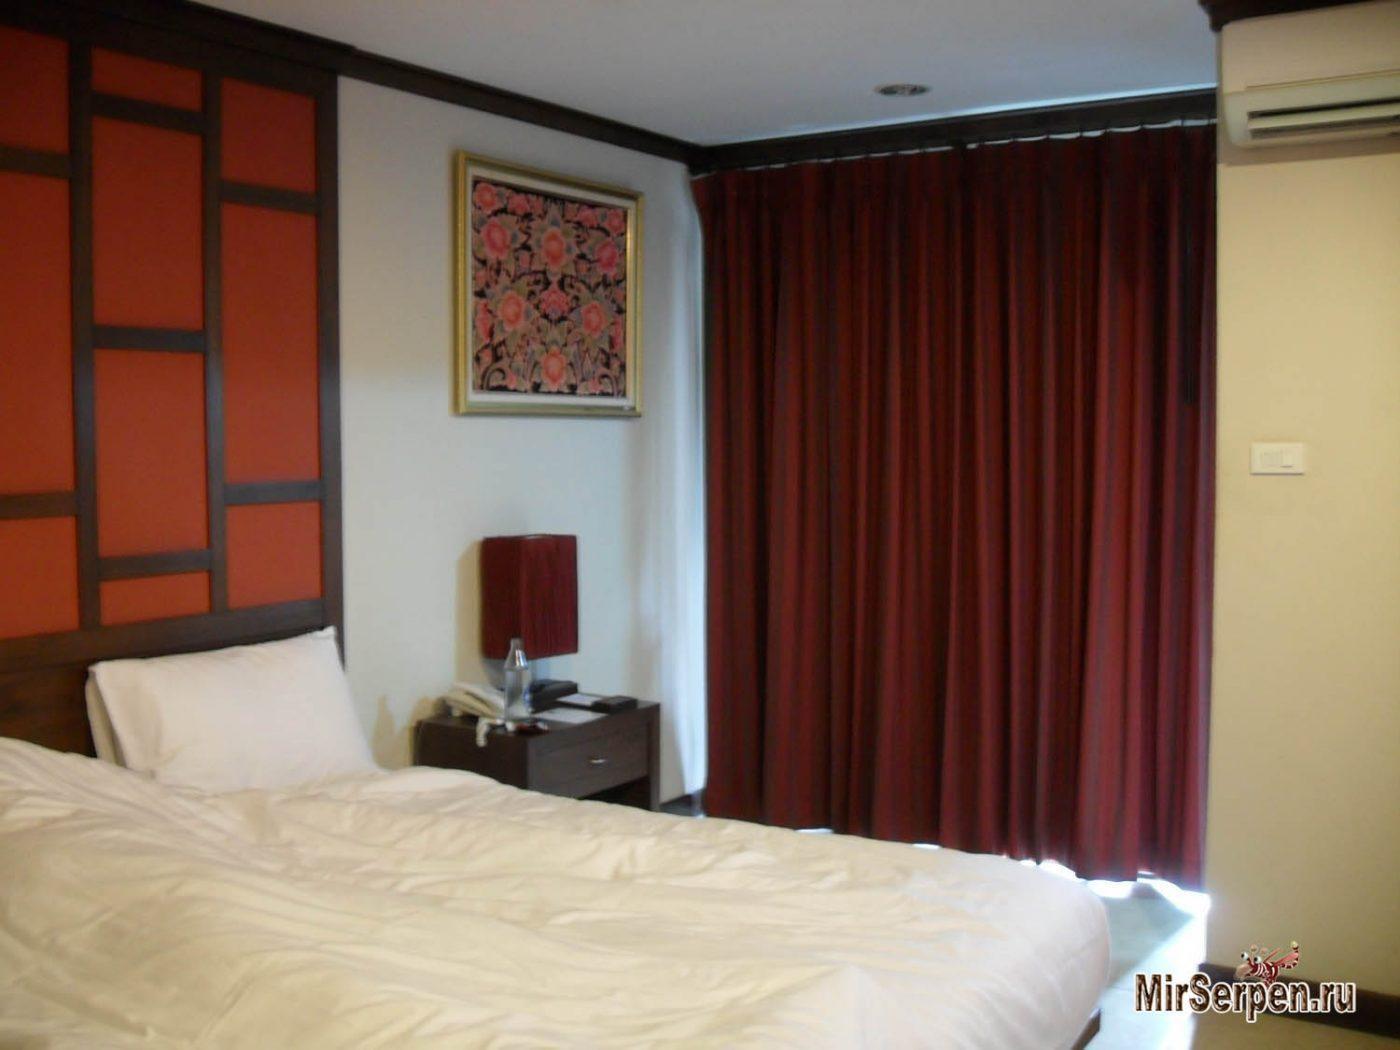 Отзыв об отеле Boonsiri Place Bangkok 3*, улица Каосан, Бангкок, Таиланд